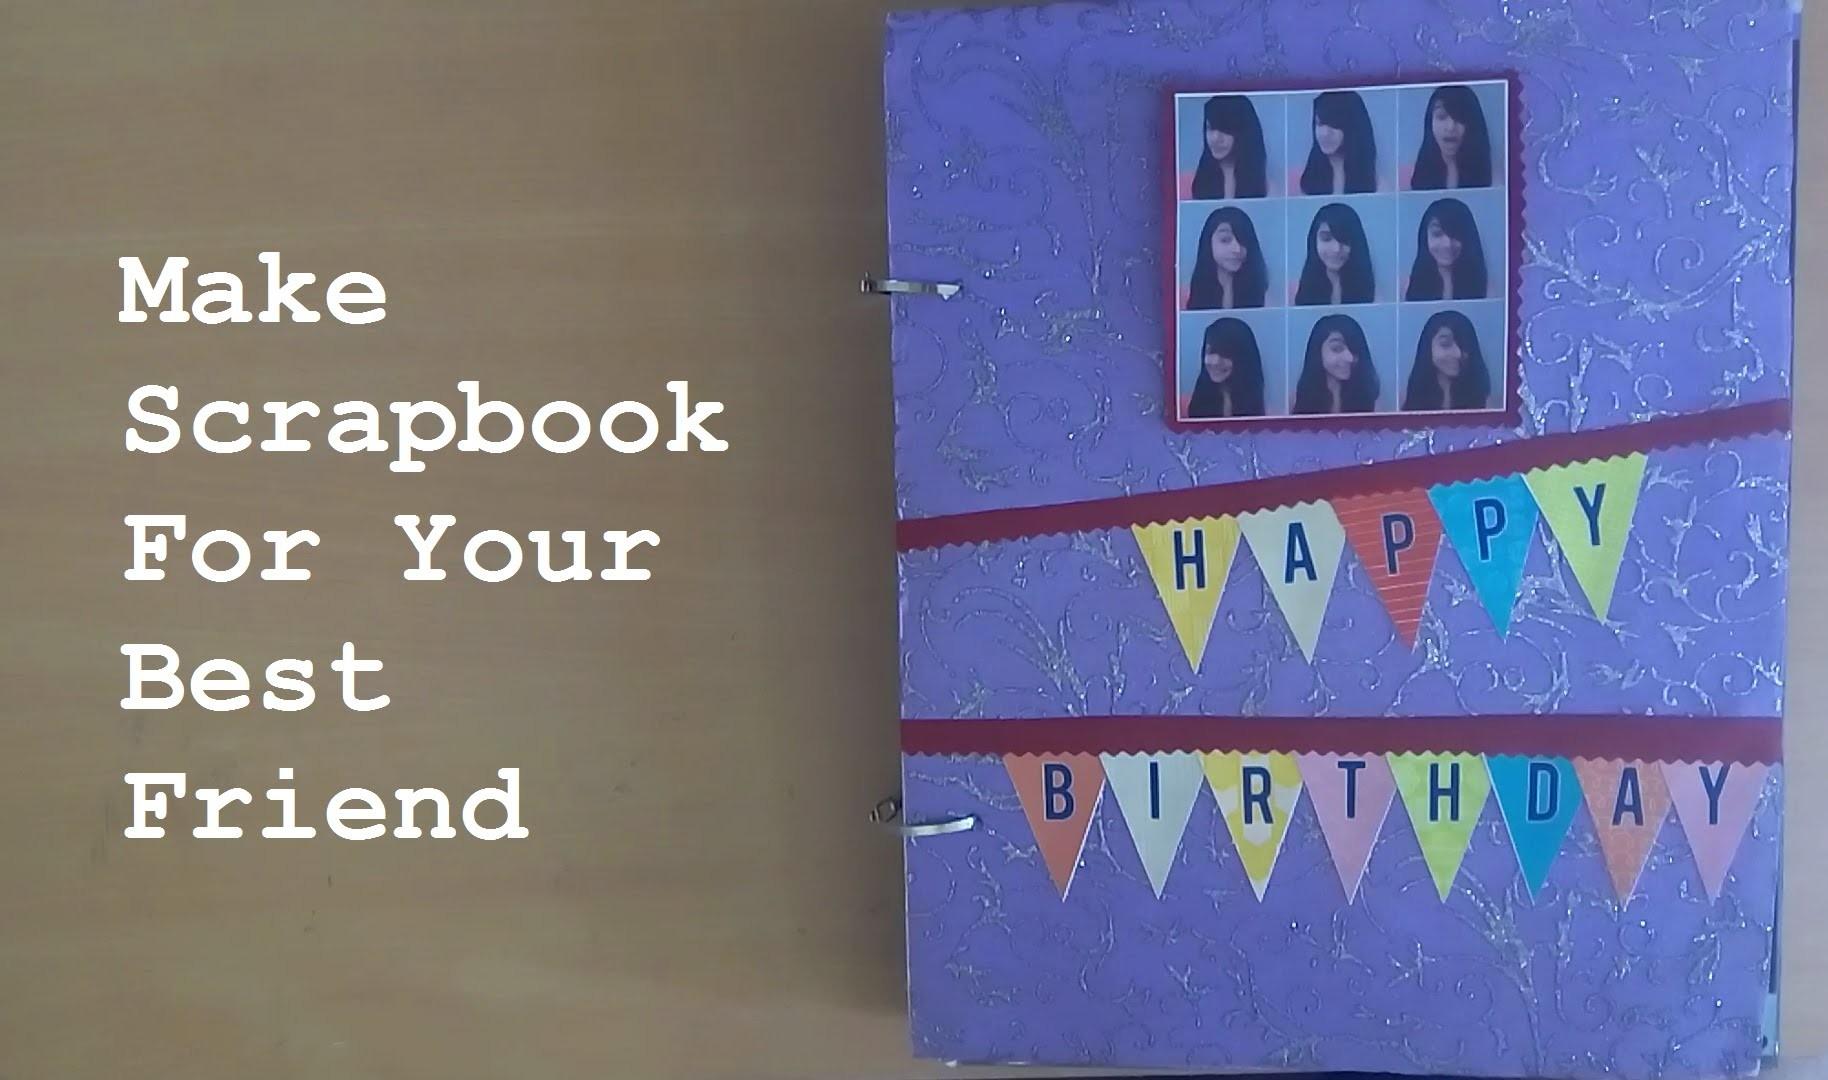 Scrapbook For Your Best Buddy | DIY Video